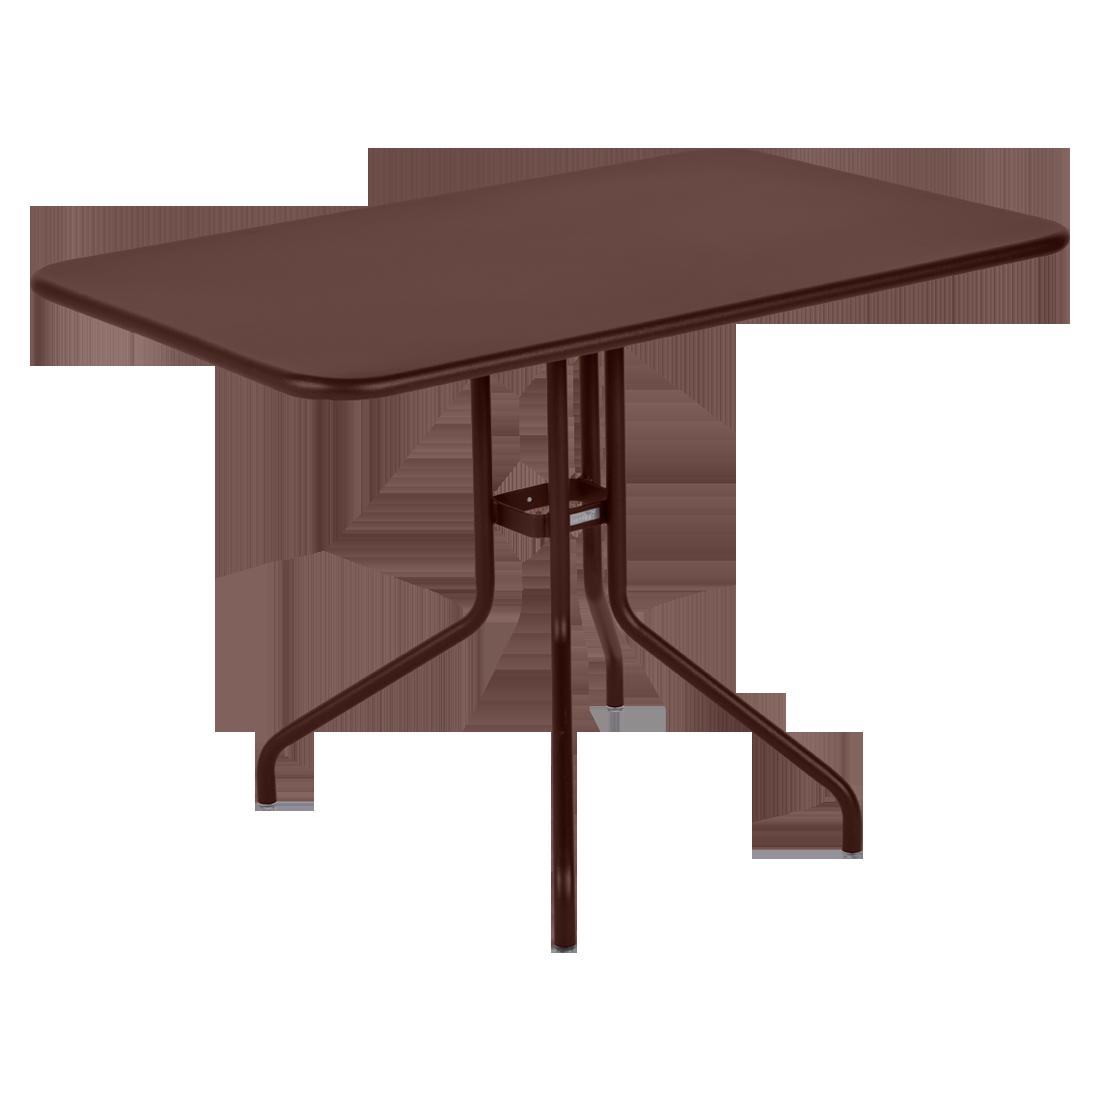 table restaurant, table terrasse, table metal, table pliante metal, mobilier restaurant, table pliante marron